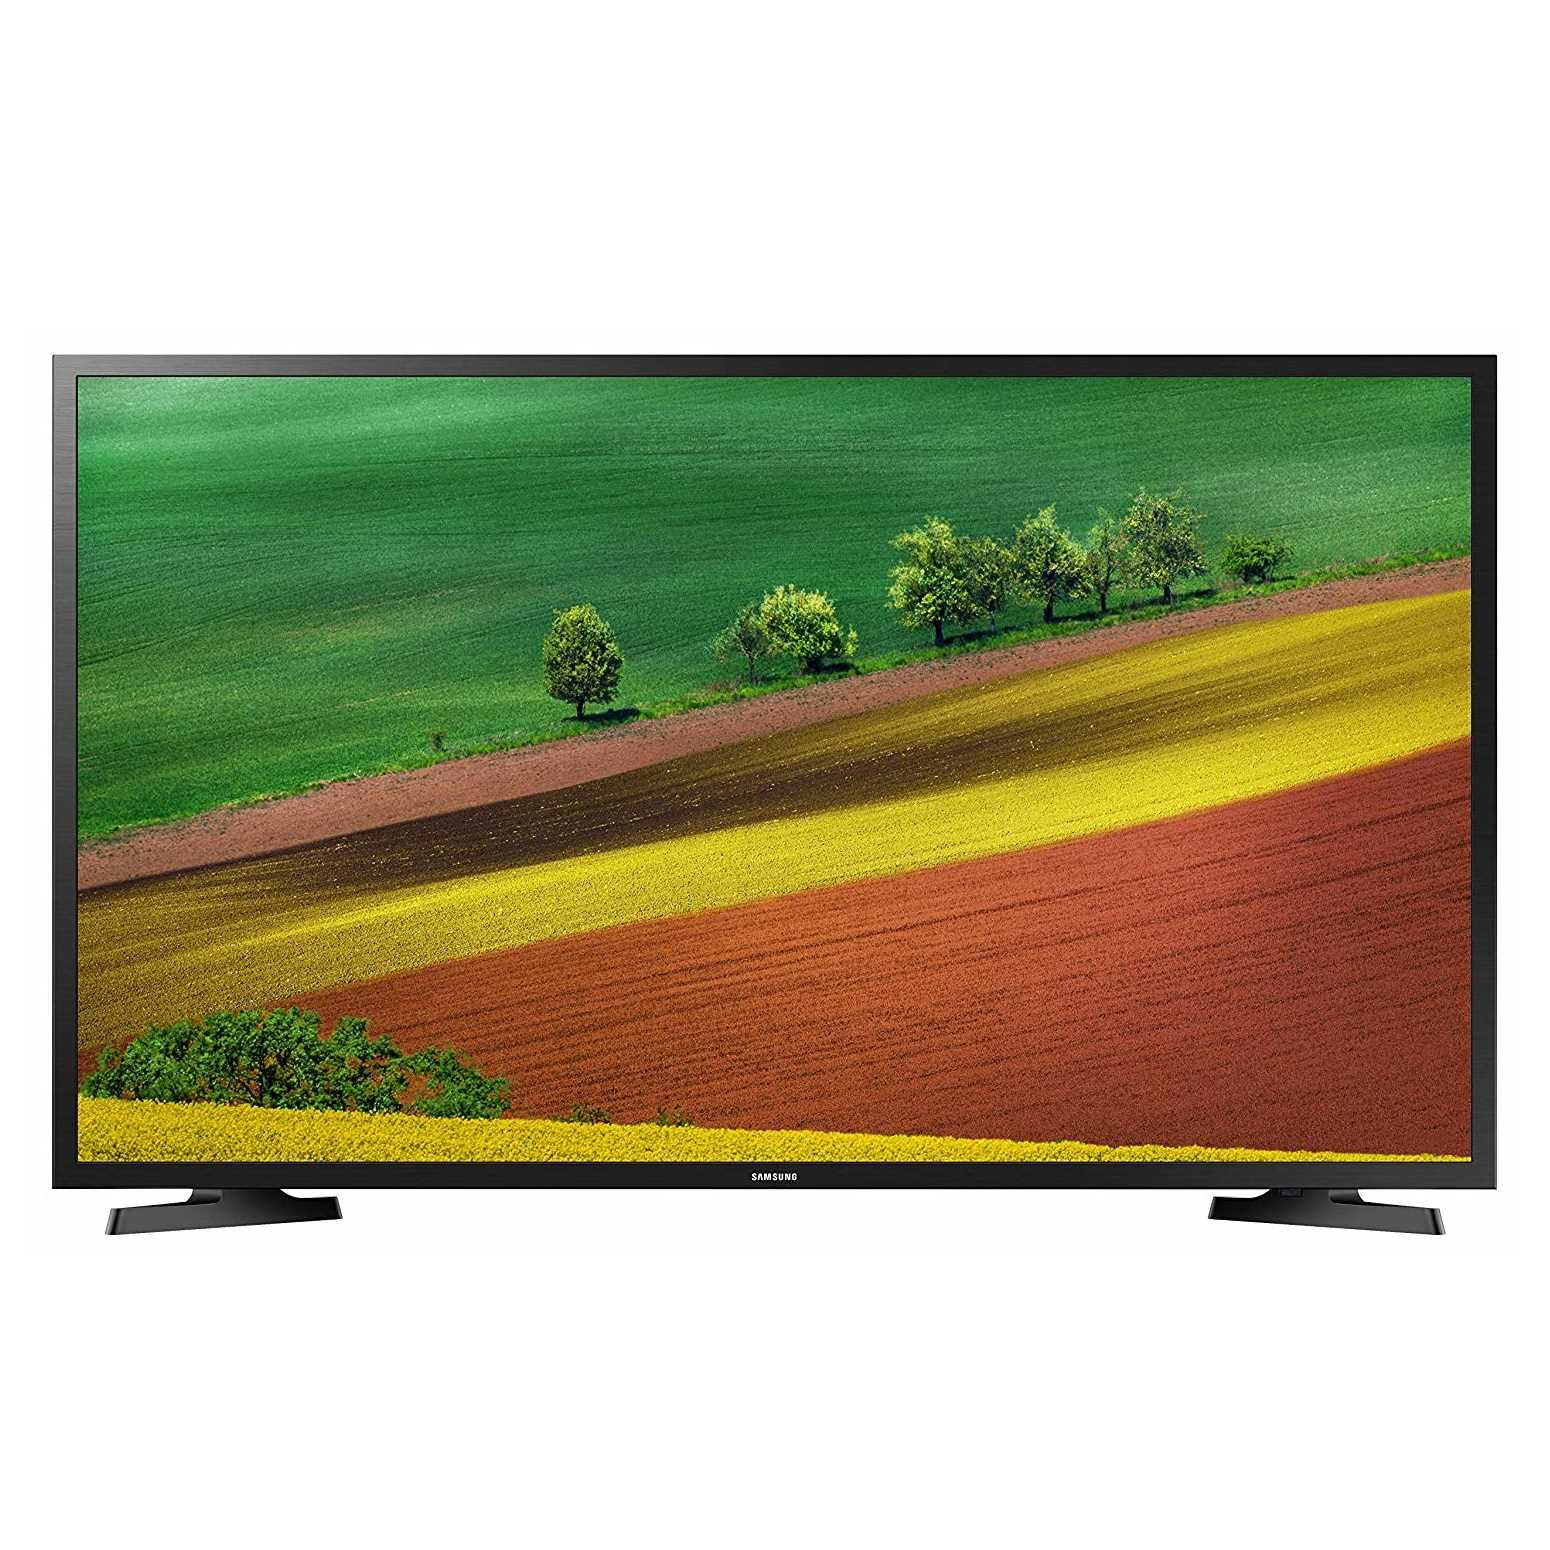 Samsung 32N4310 32 Inch HD Ready Smart LED Television